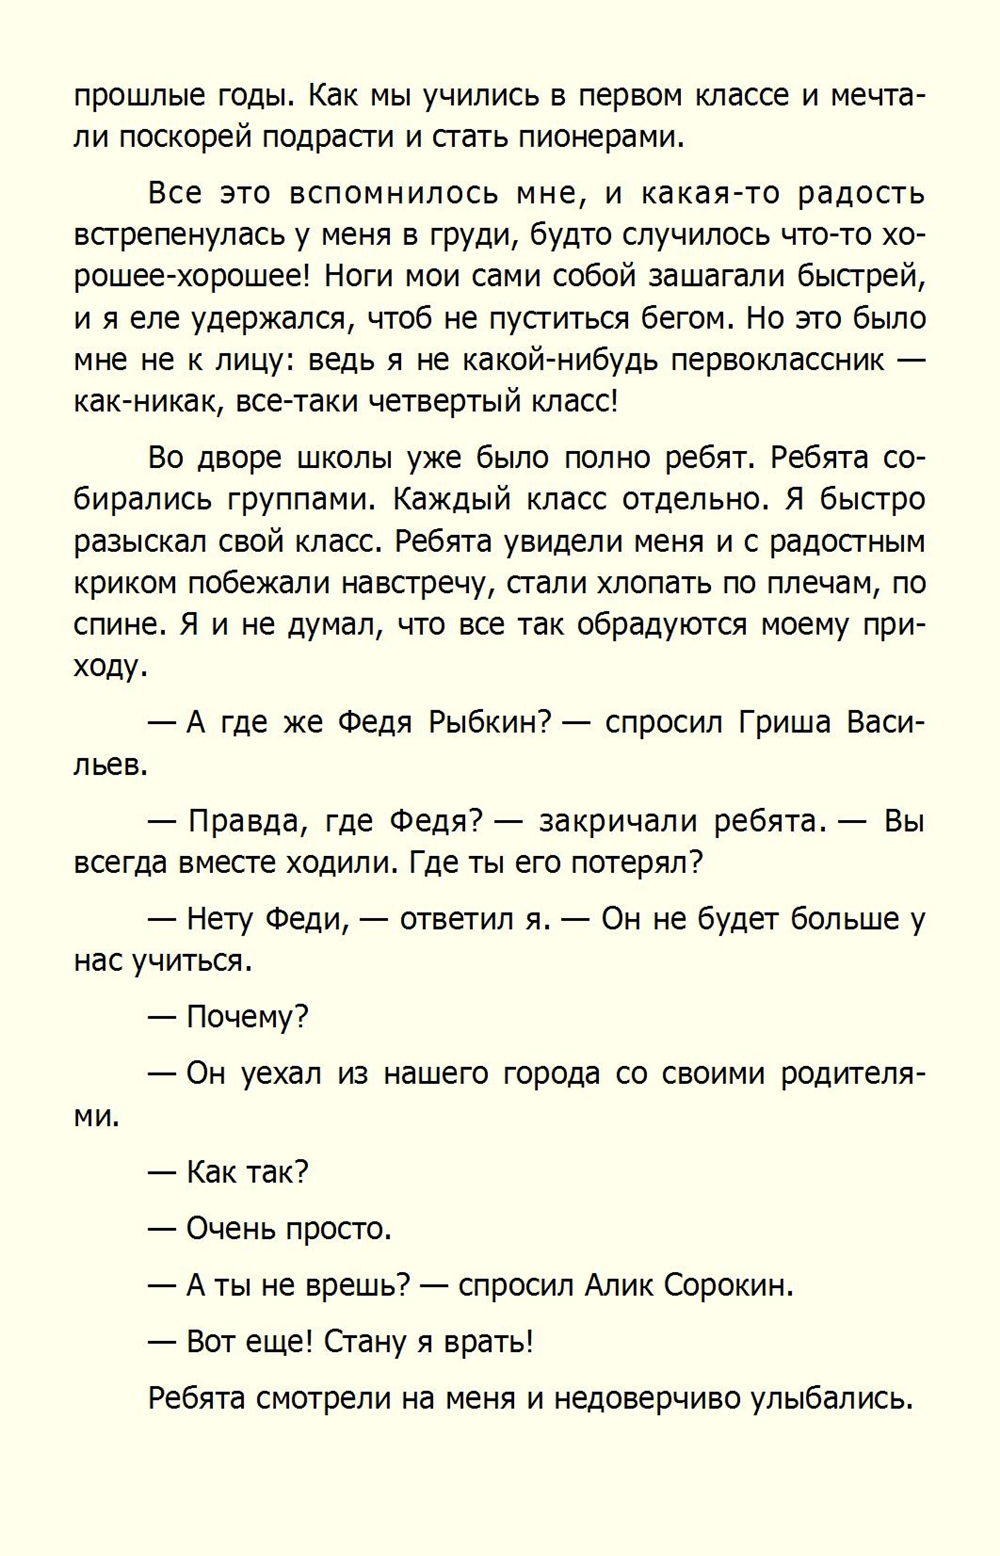 http://ipic.su/img/img7/fs/01.1598002073.jpg